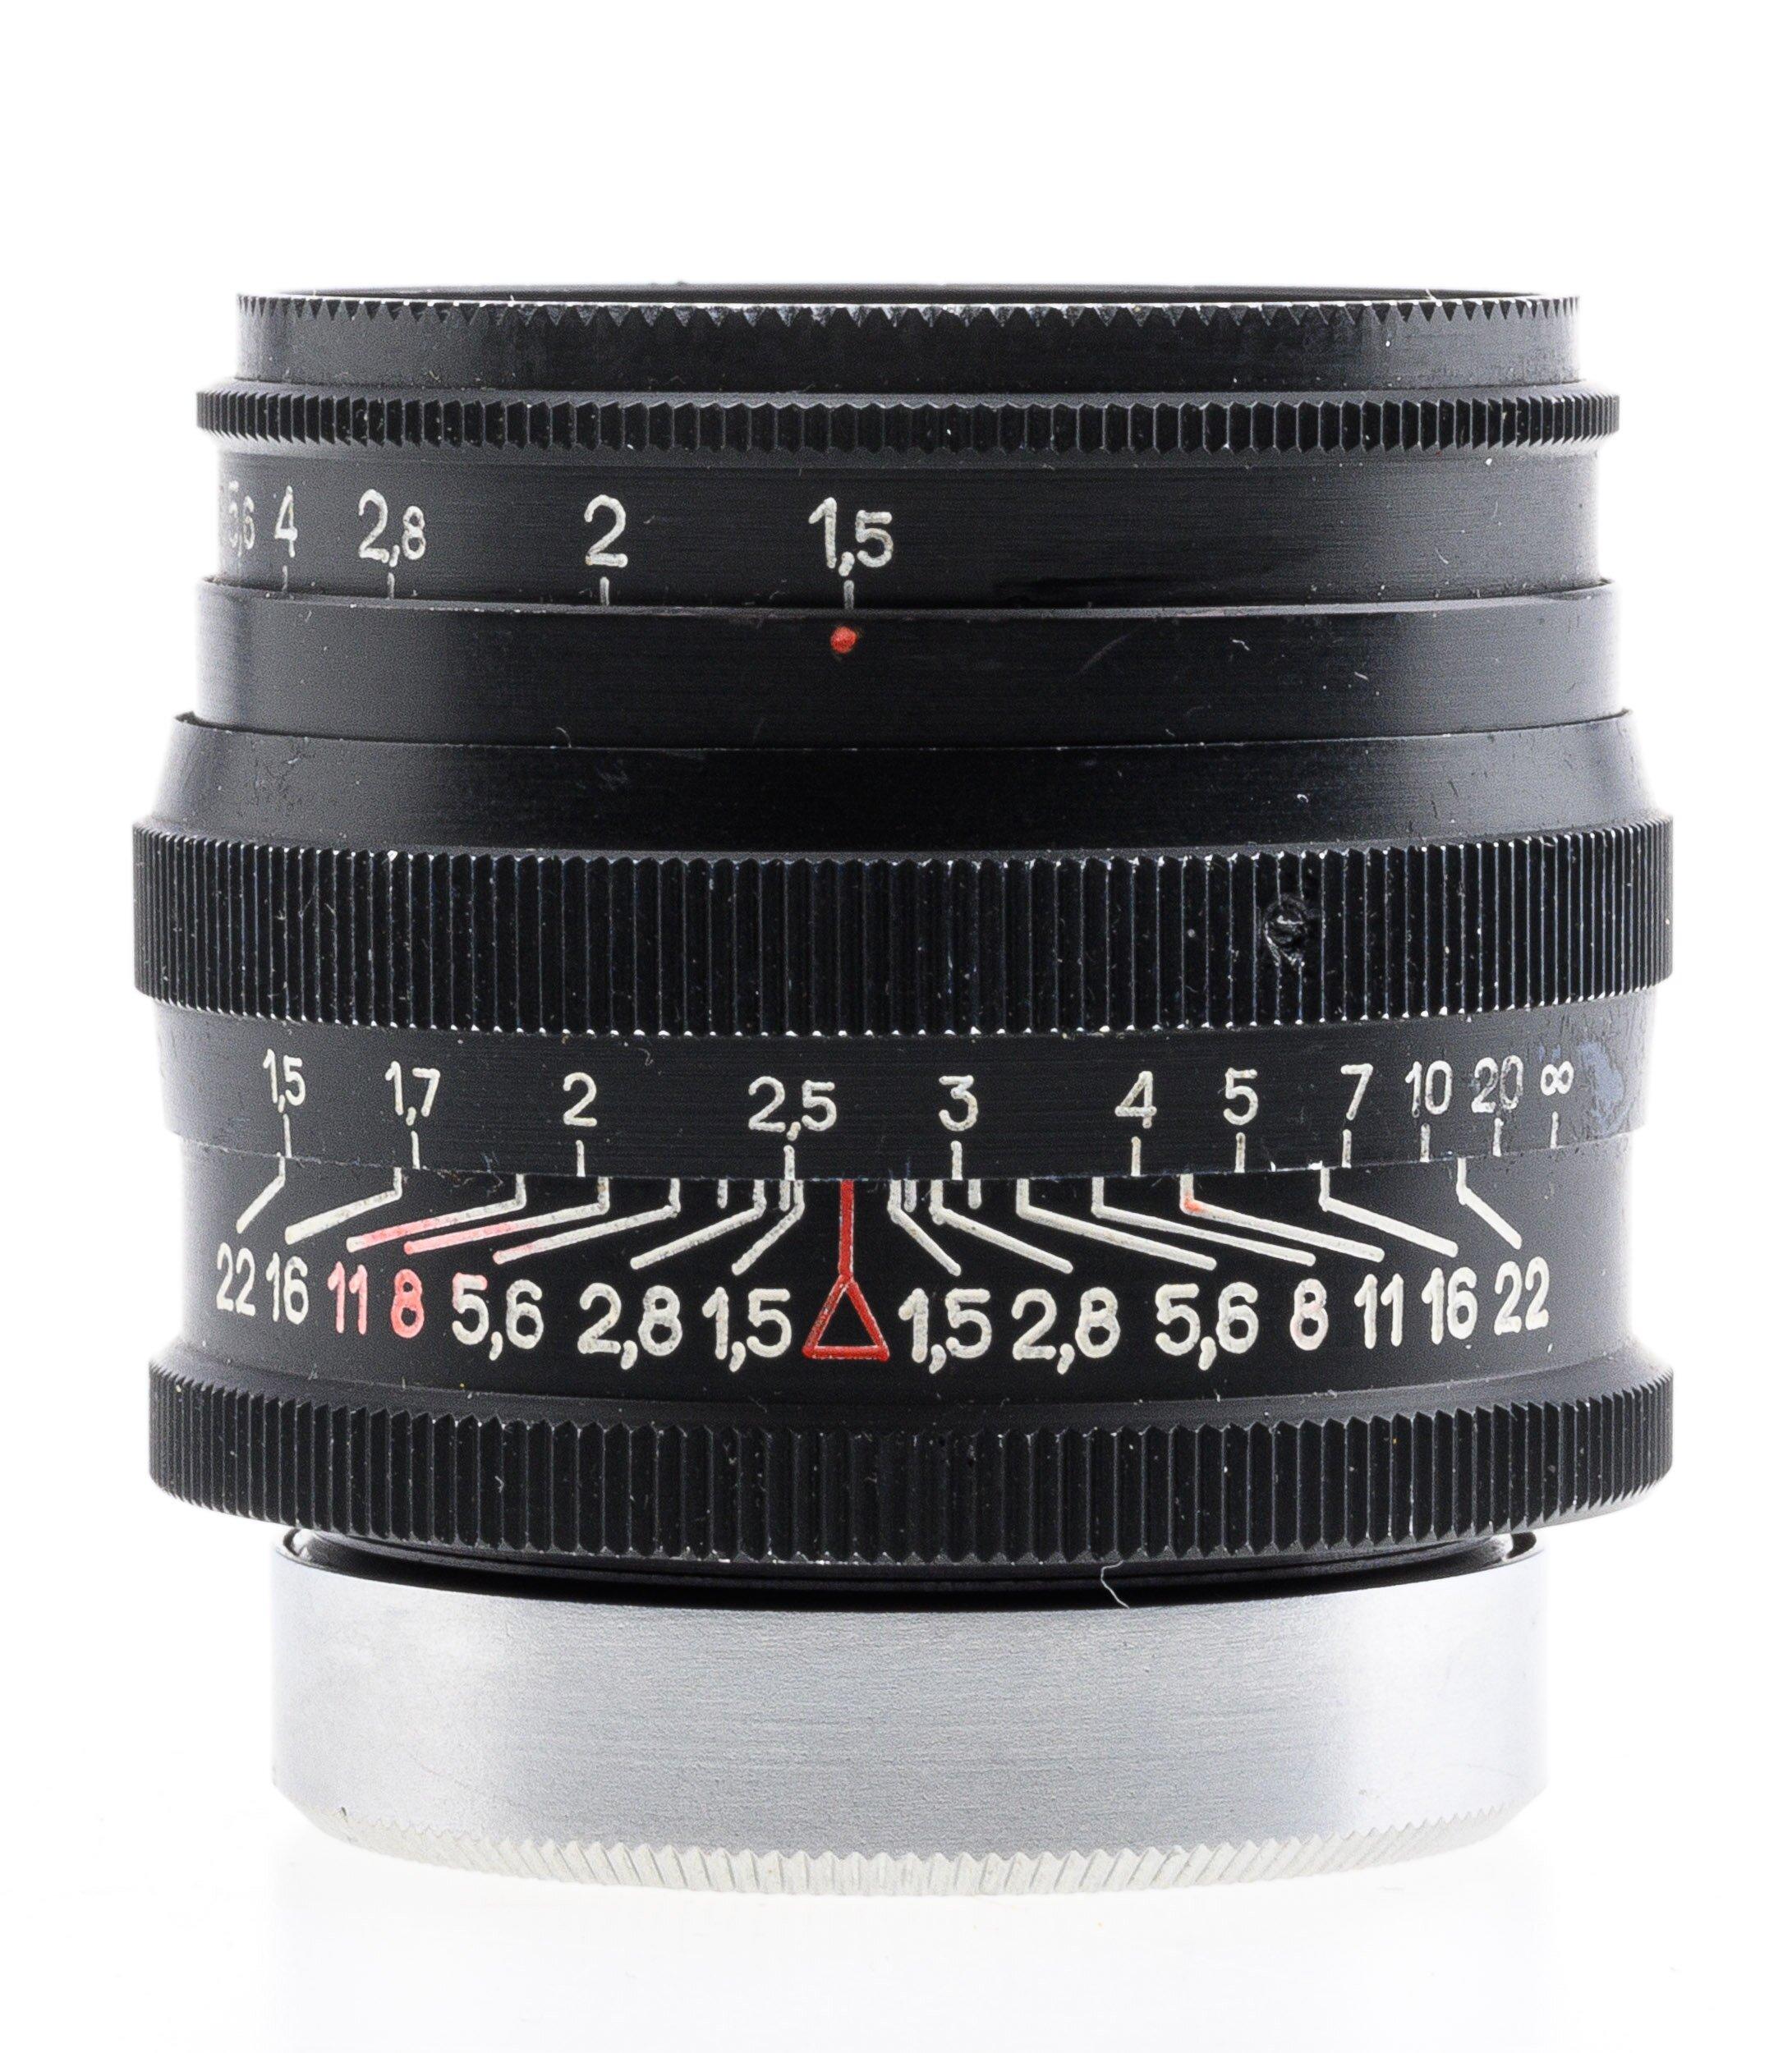 Jupiter-3 1.5/50 M39 50mm f1.5 schwarz